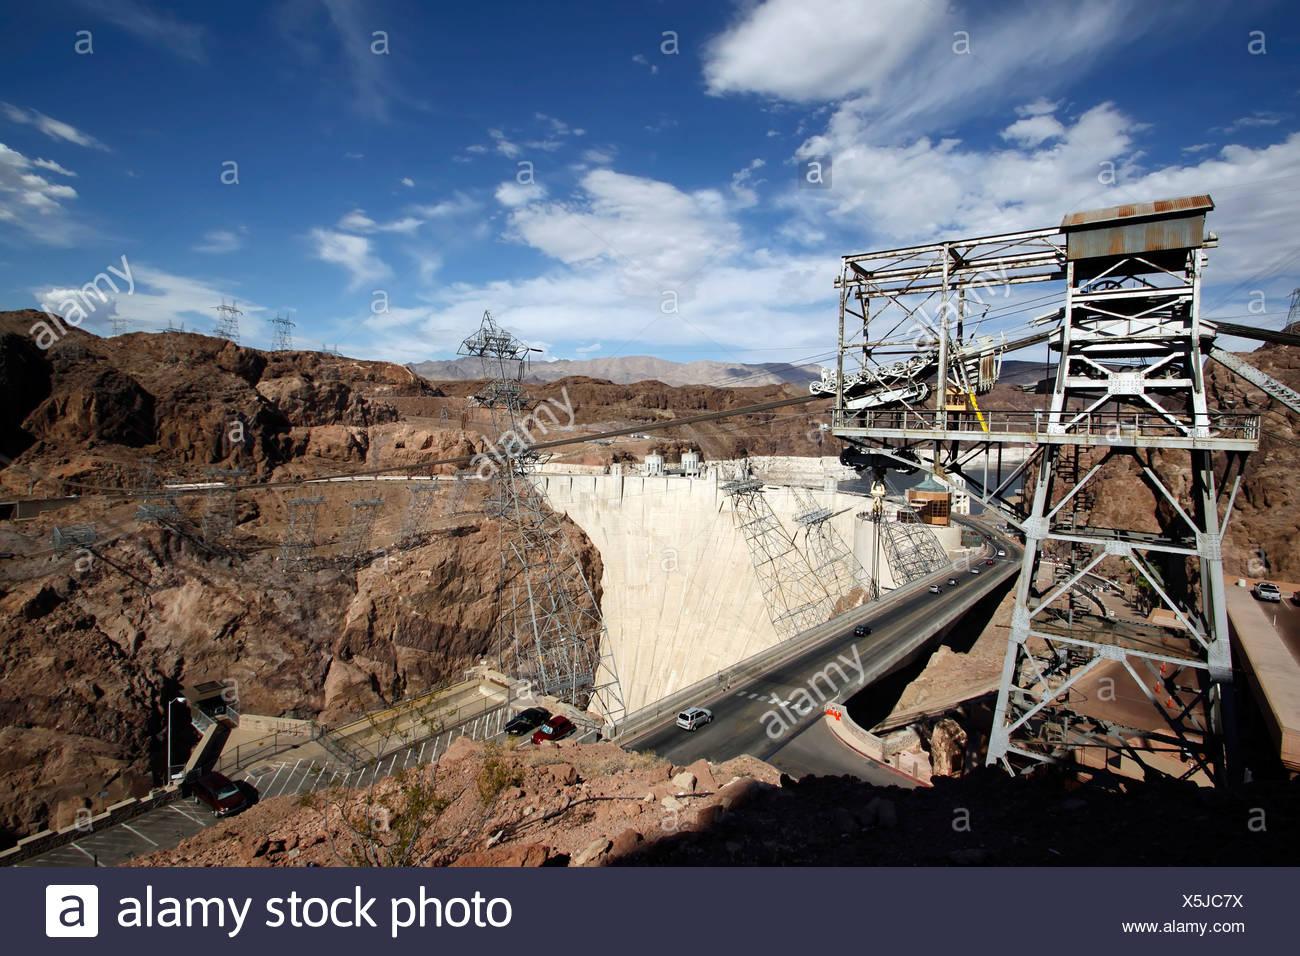 Lake Mead reservoir, Hoover Dam, Nevada, Arizona, USA Stock Photo